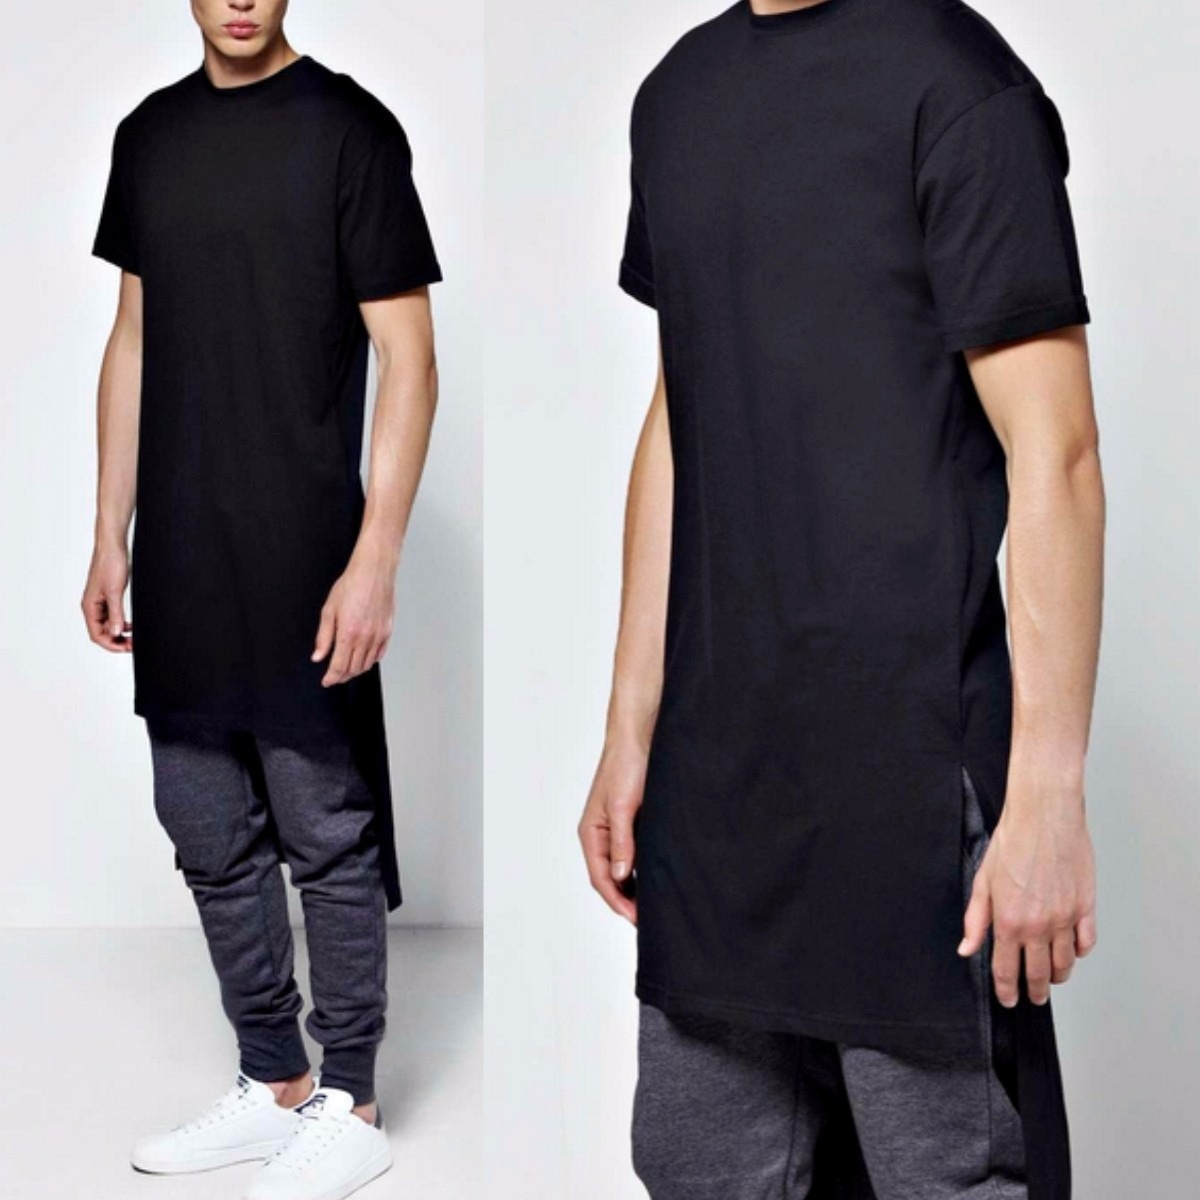 9847a1db3 camiseta camisa oversized swag longline masculina super long. Carregando  zoom.